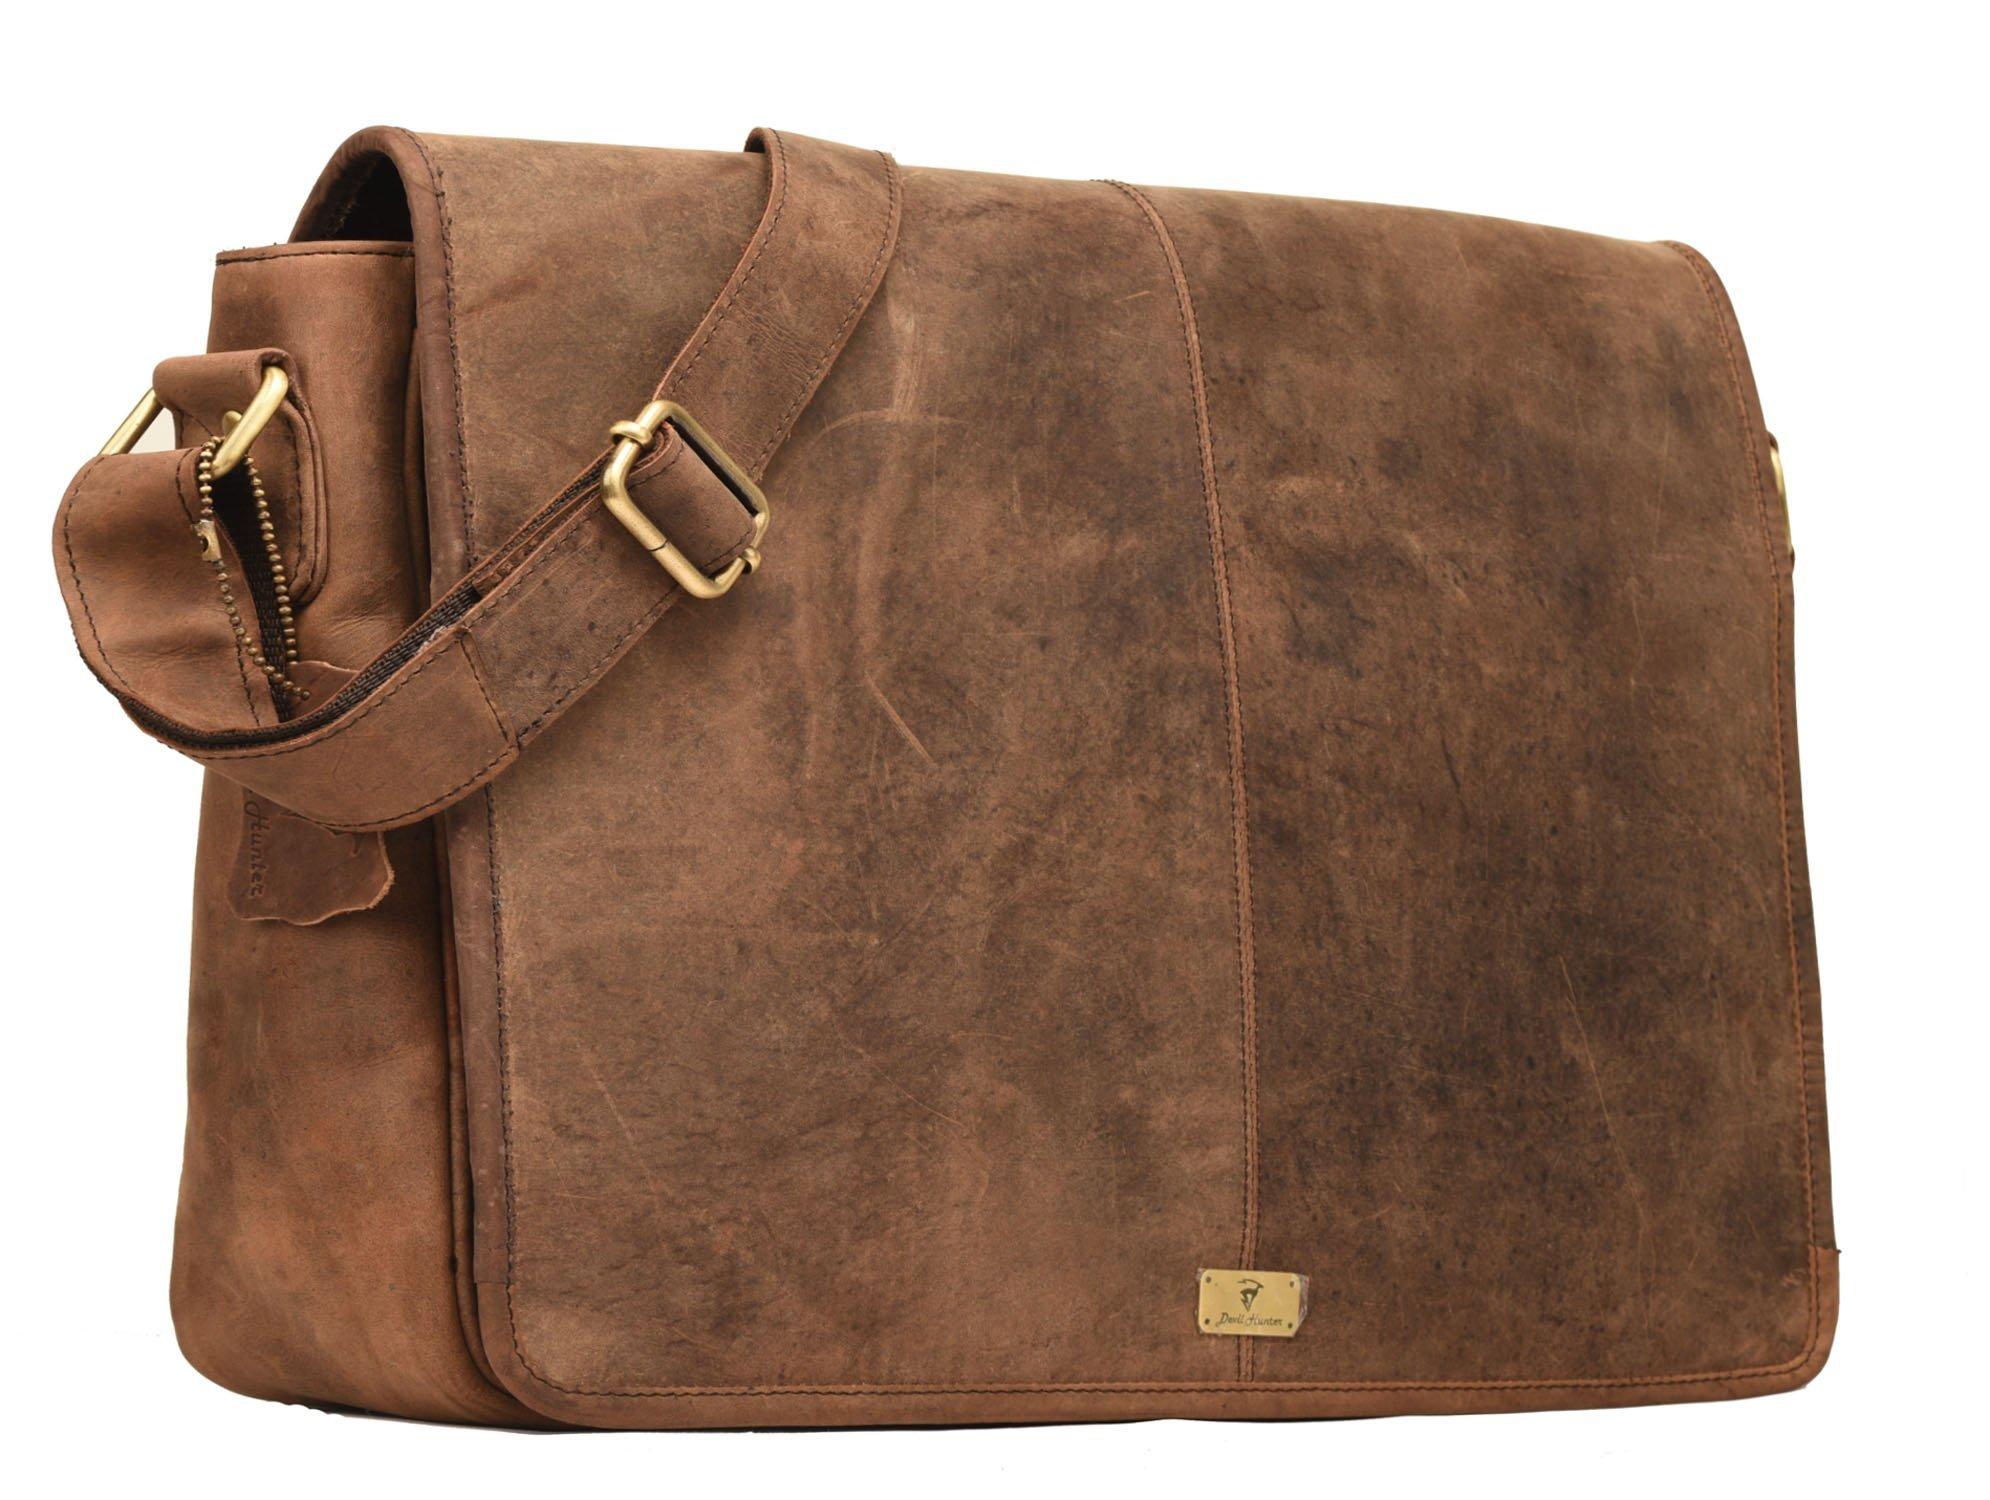 Devil Hunter DH Rohtaang Leather Messenger Bag for men/women Leather Laptop Messenger Briefcase Satchel Brown